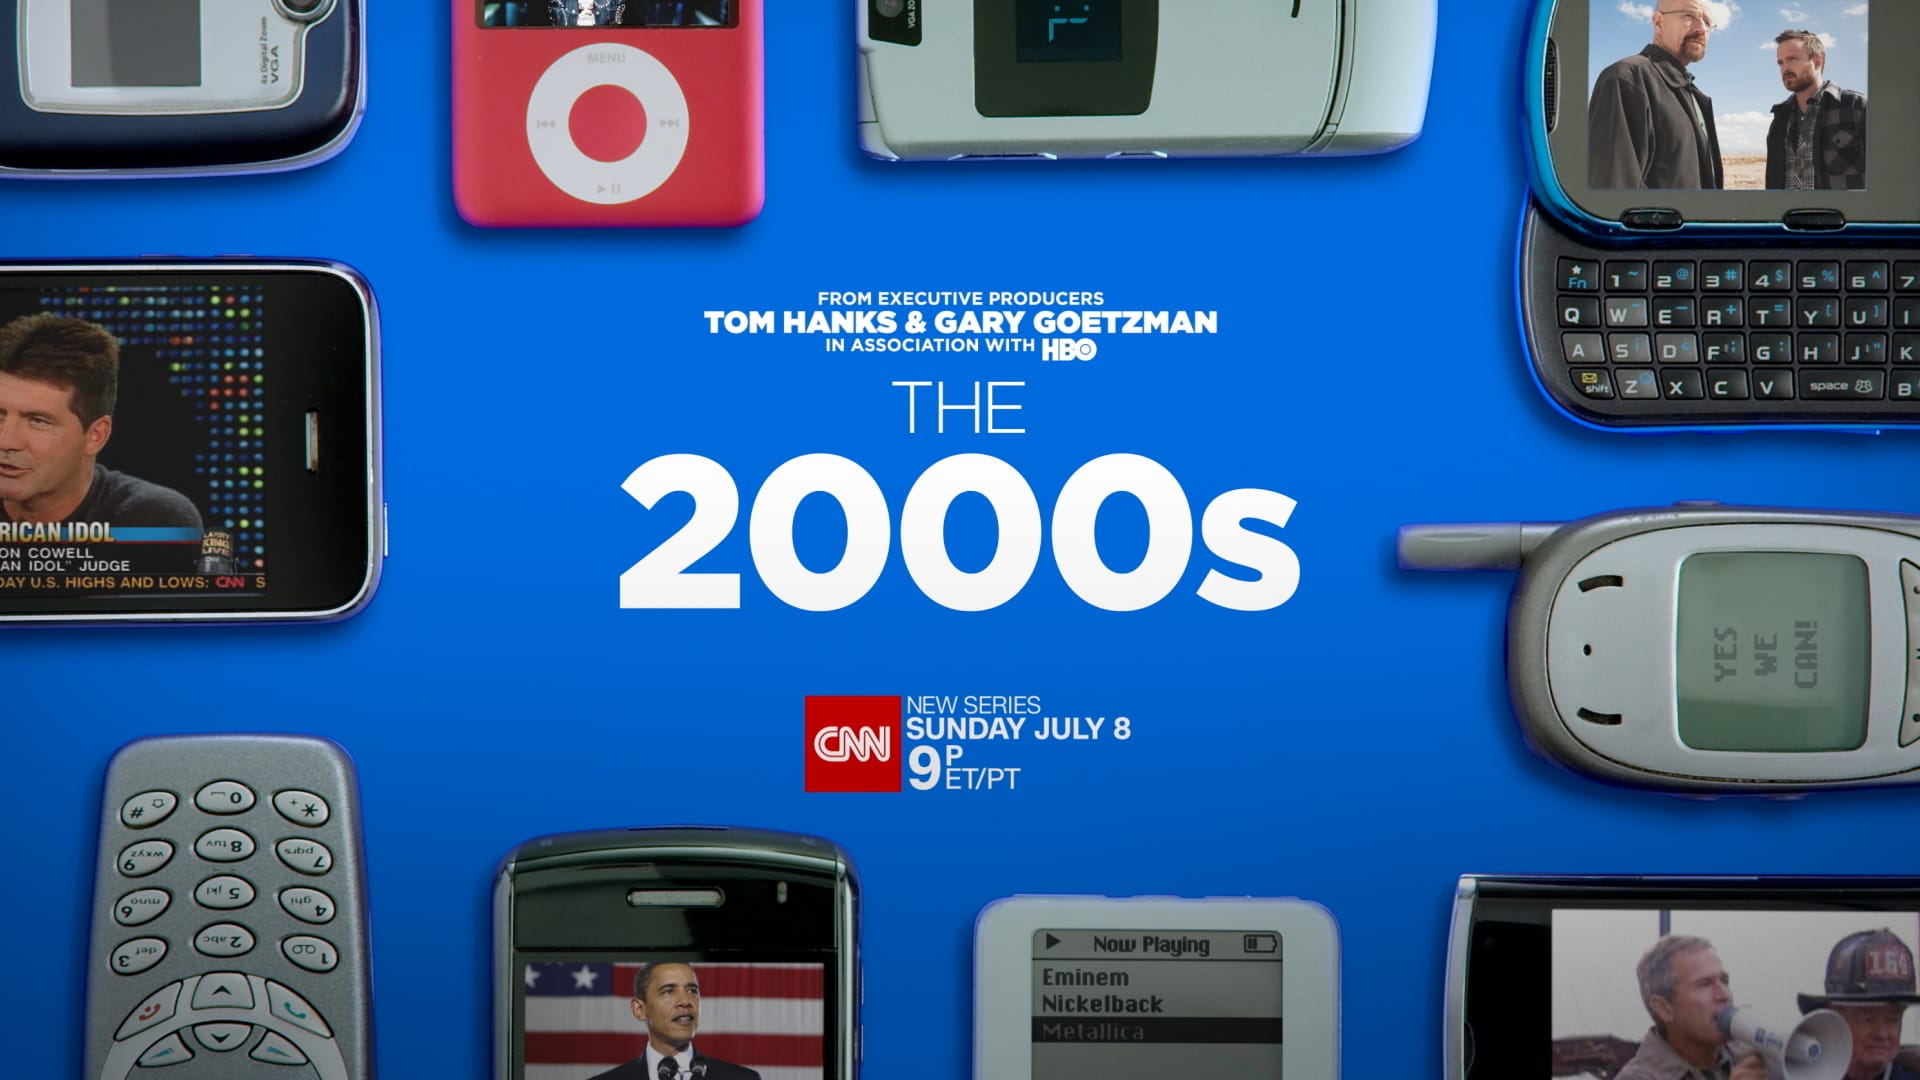 cnn_the2000s_trailer1_thumb.jpg